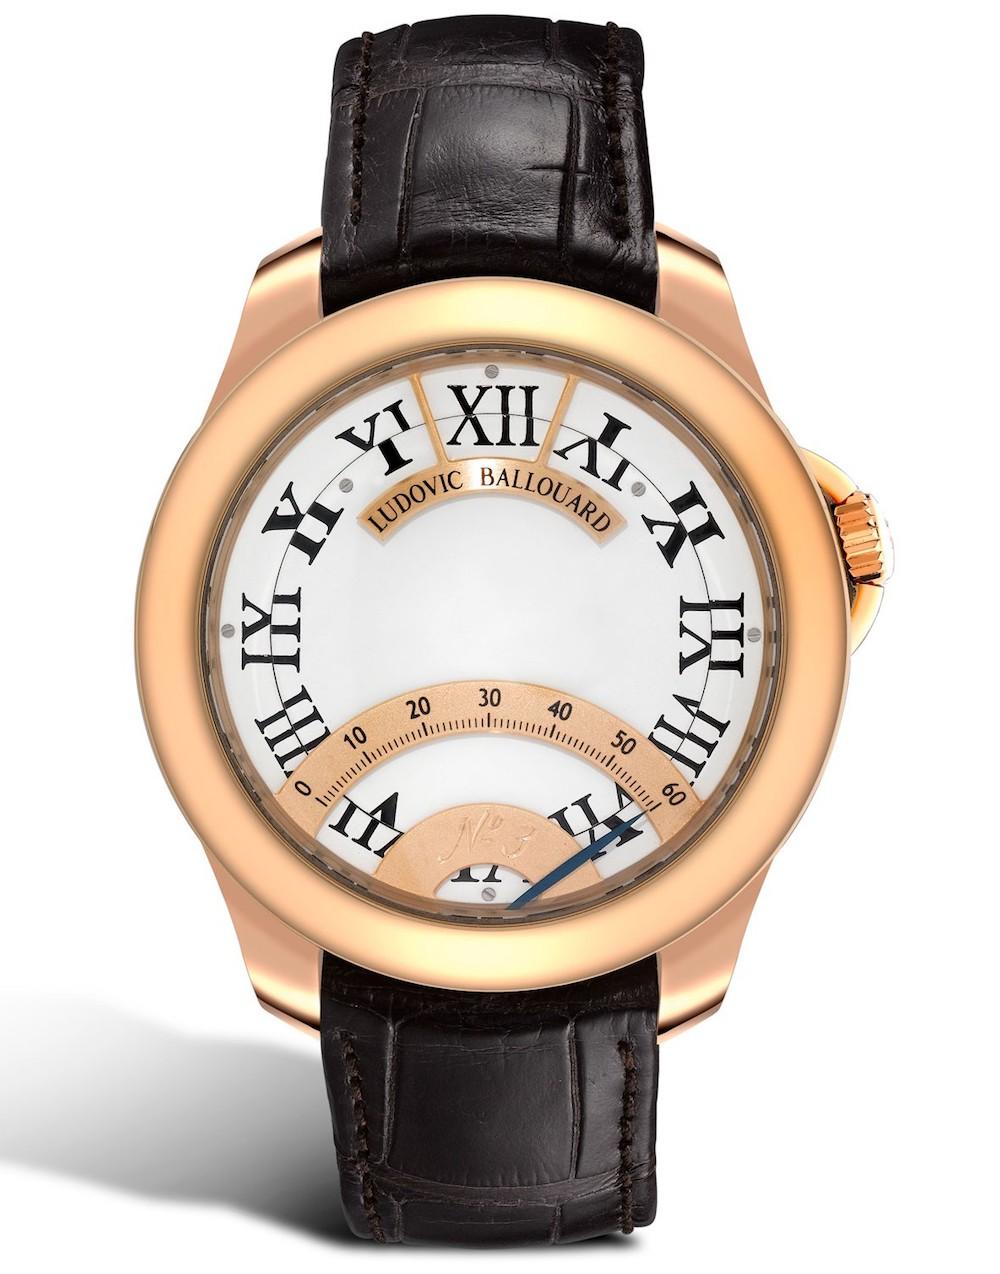 ludovic-ballouard-upside-down-white-dial-red-gold-1-w1752-karora-luxusora-svajci-ora-orasblog.jpg